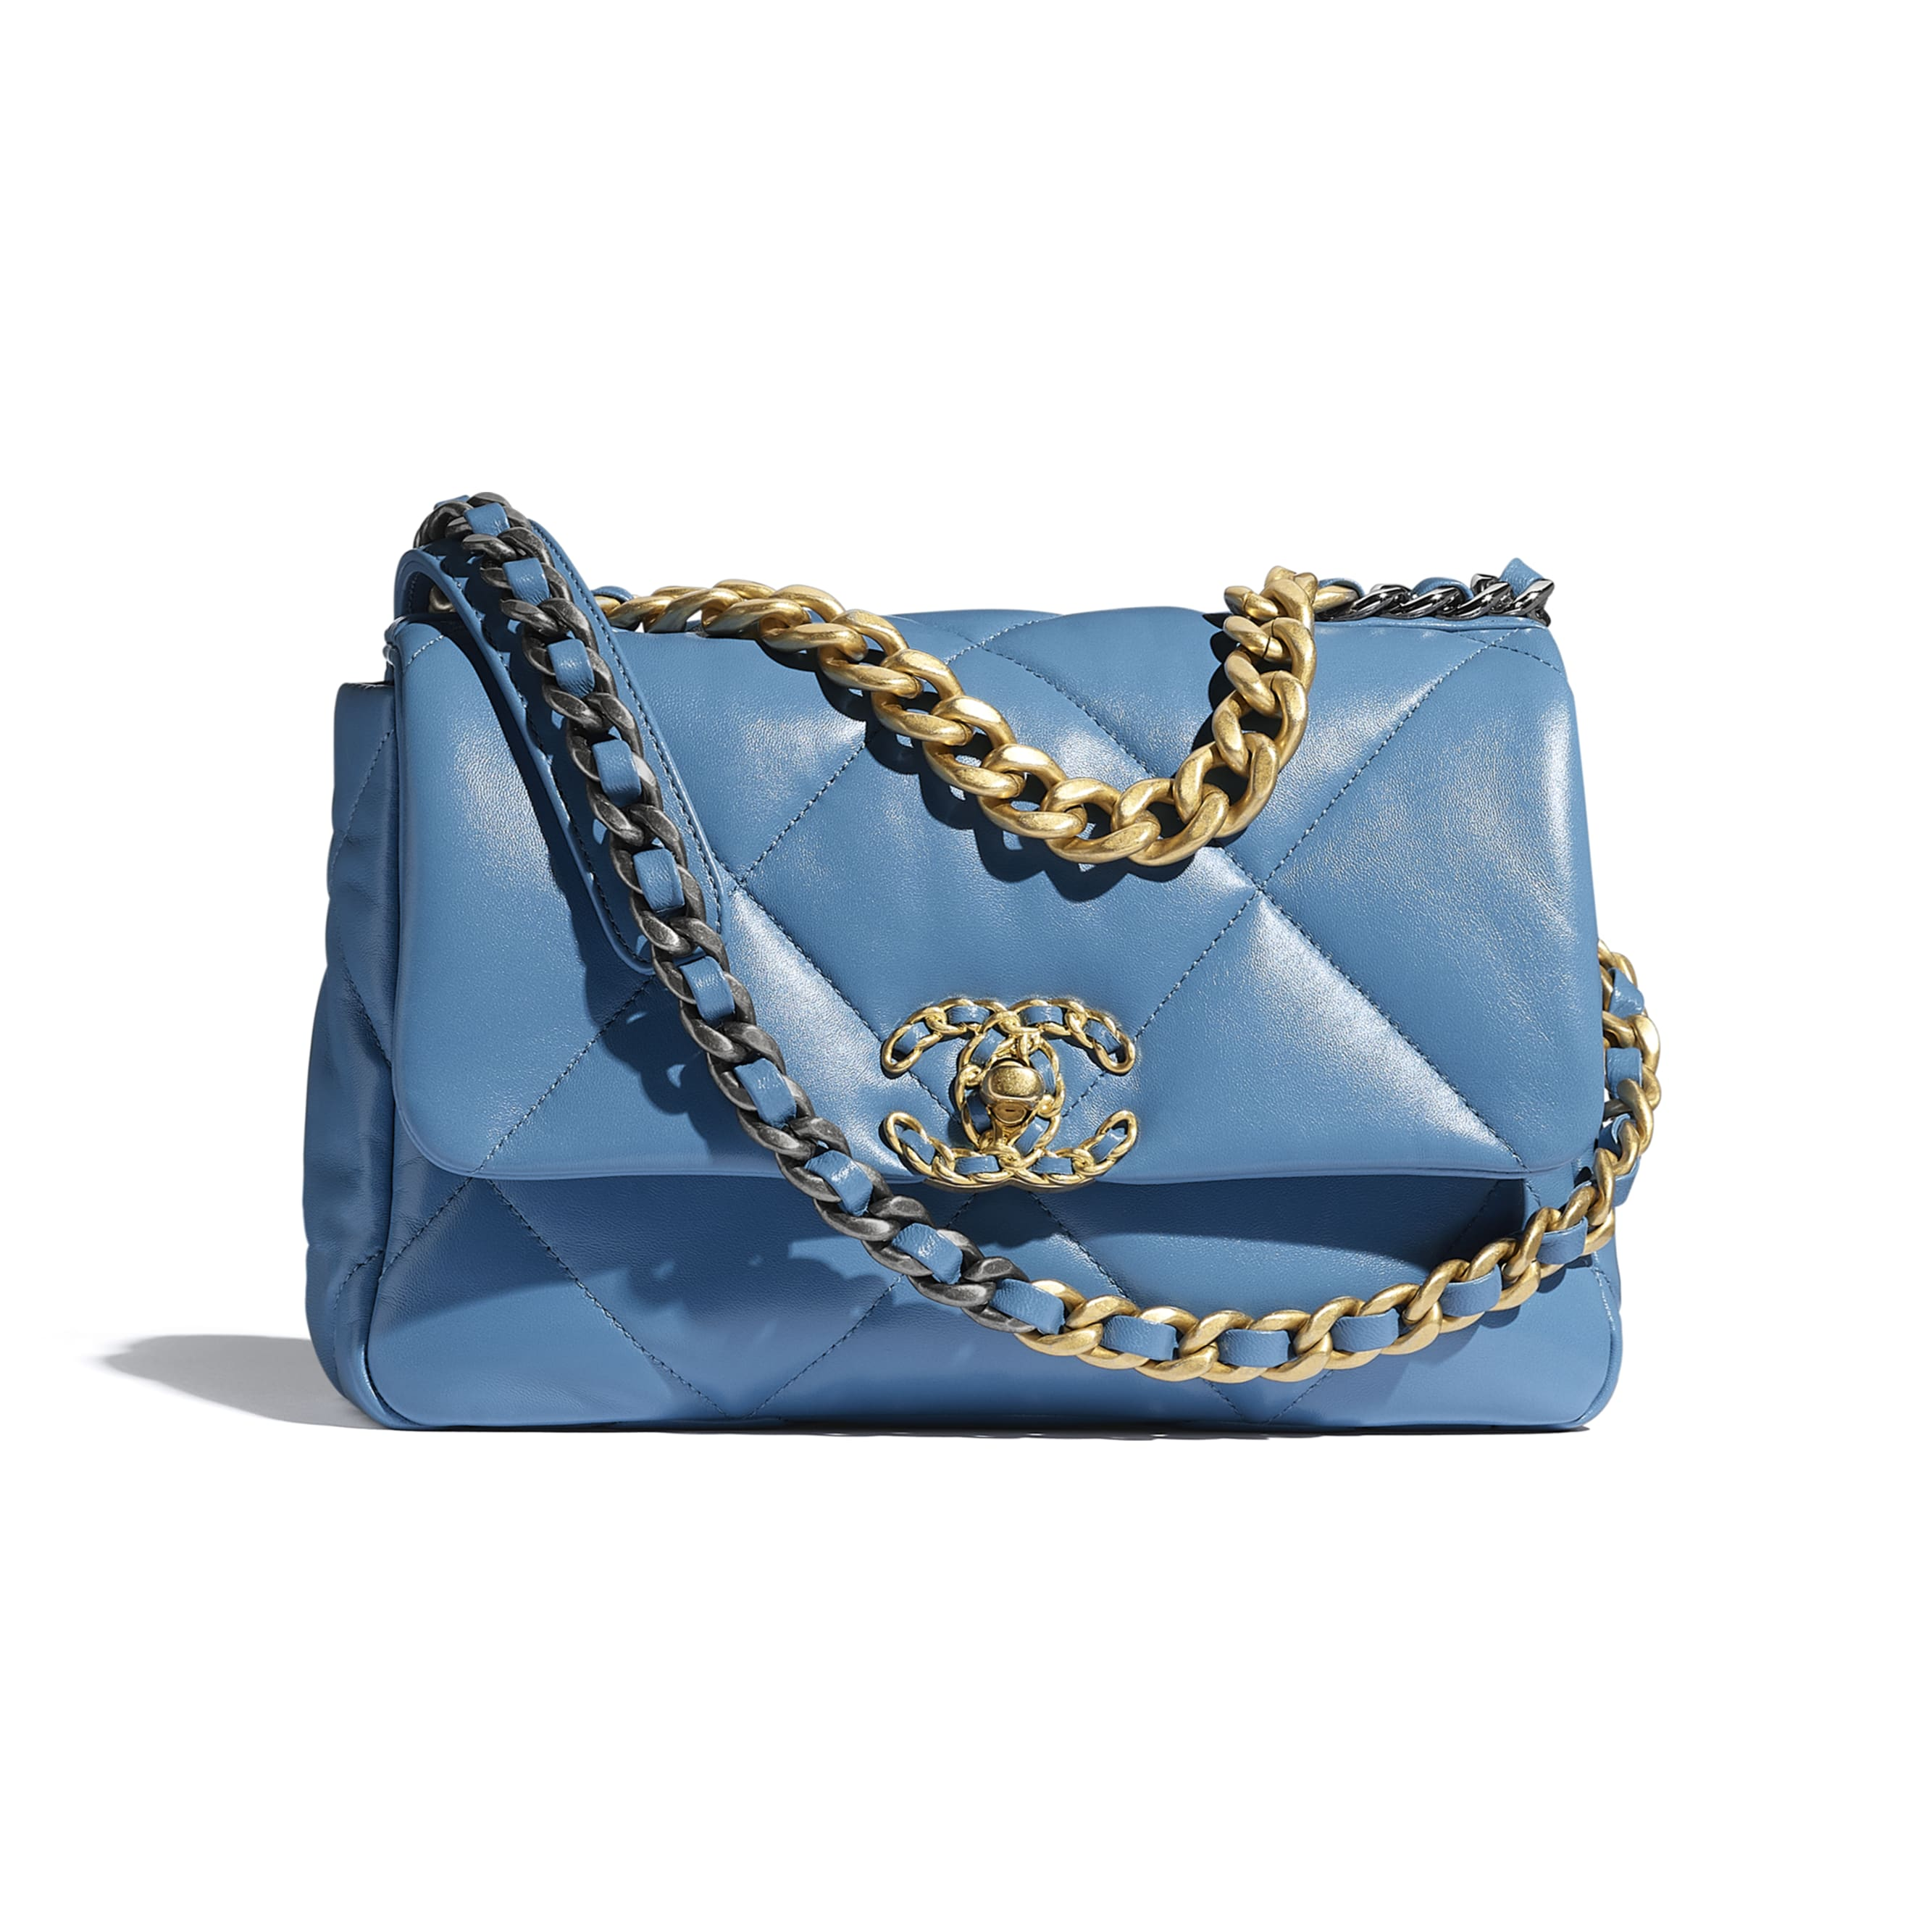 CHANEL 19 Handbag - Blue - Lambskin, Gold-Tone, Silver-Tone & Ruthenium-Finish Metal - CHANEL - Default view - see standard sized version